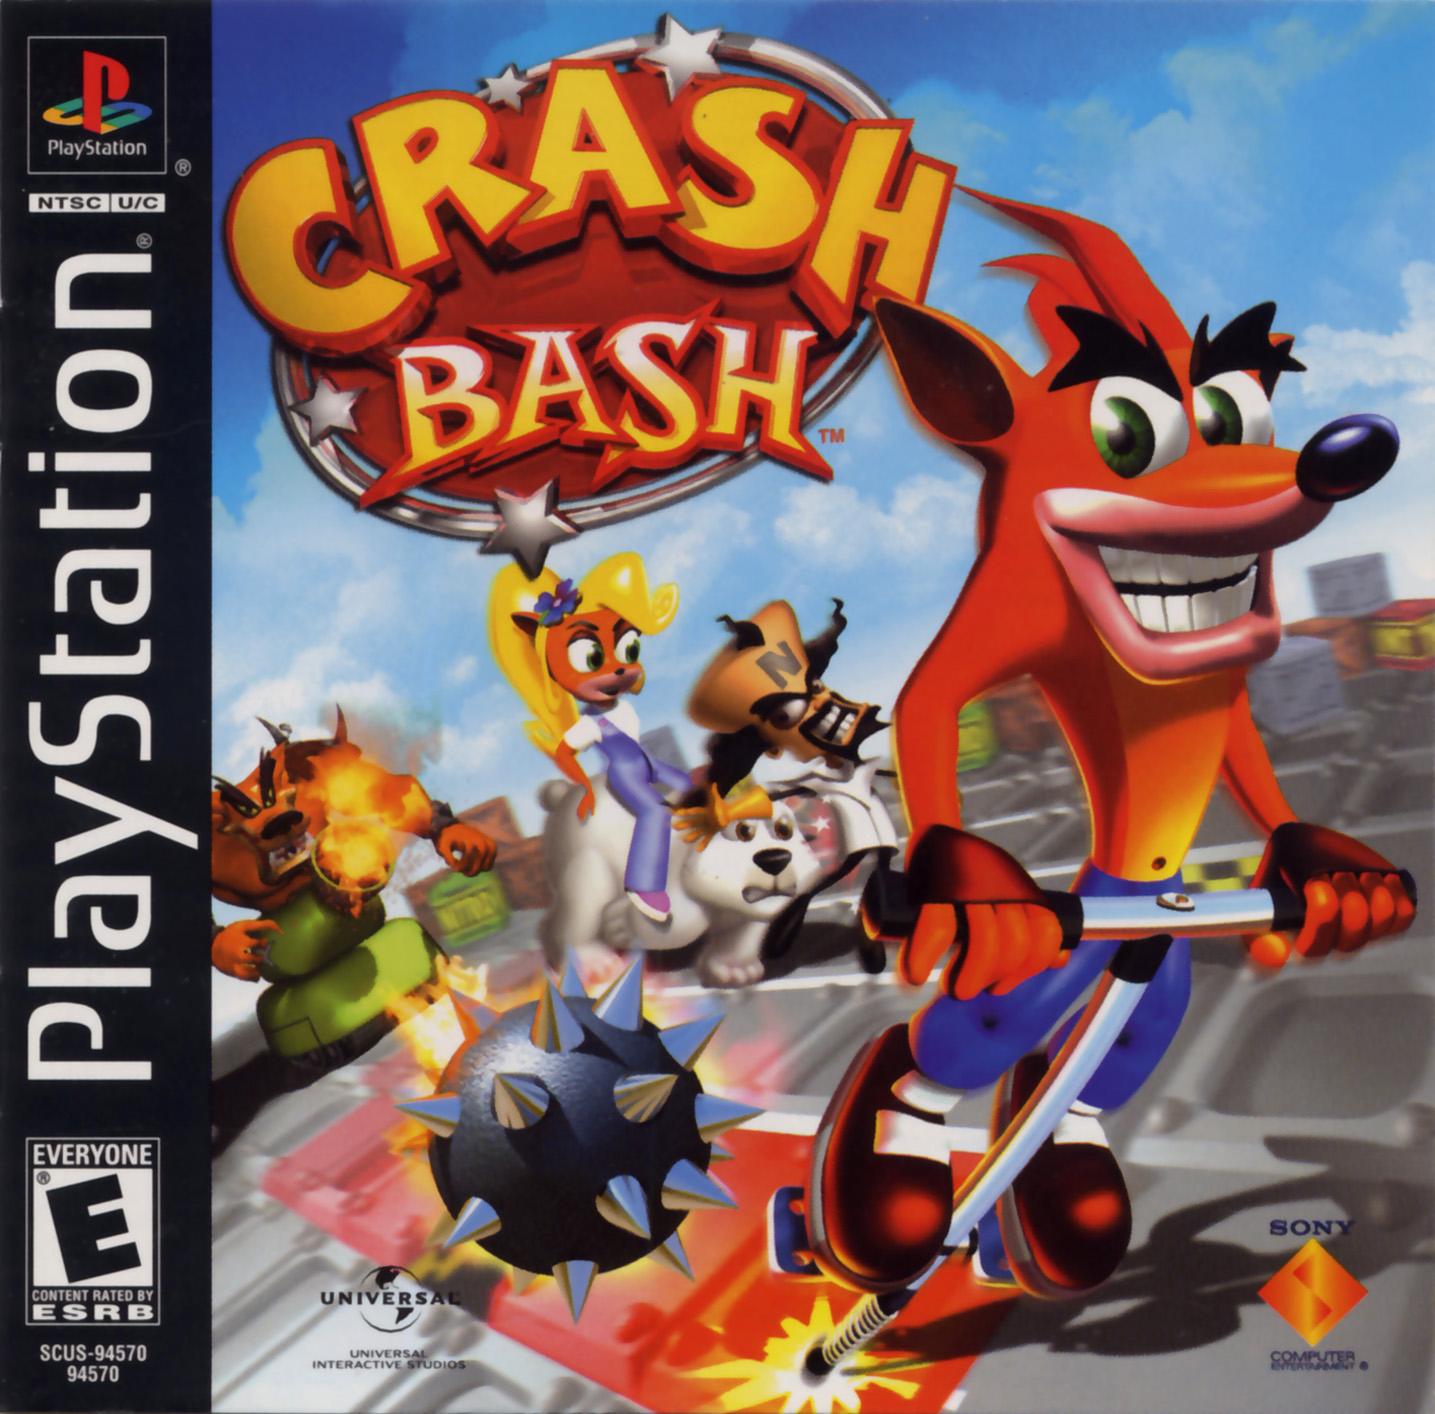 Crash Bash | Bandipedia | FANDOM powered by Wikia